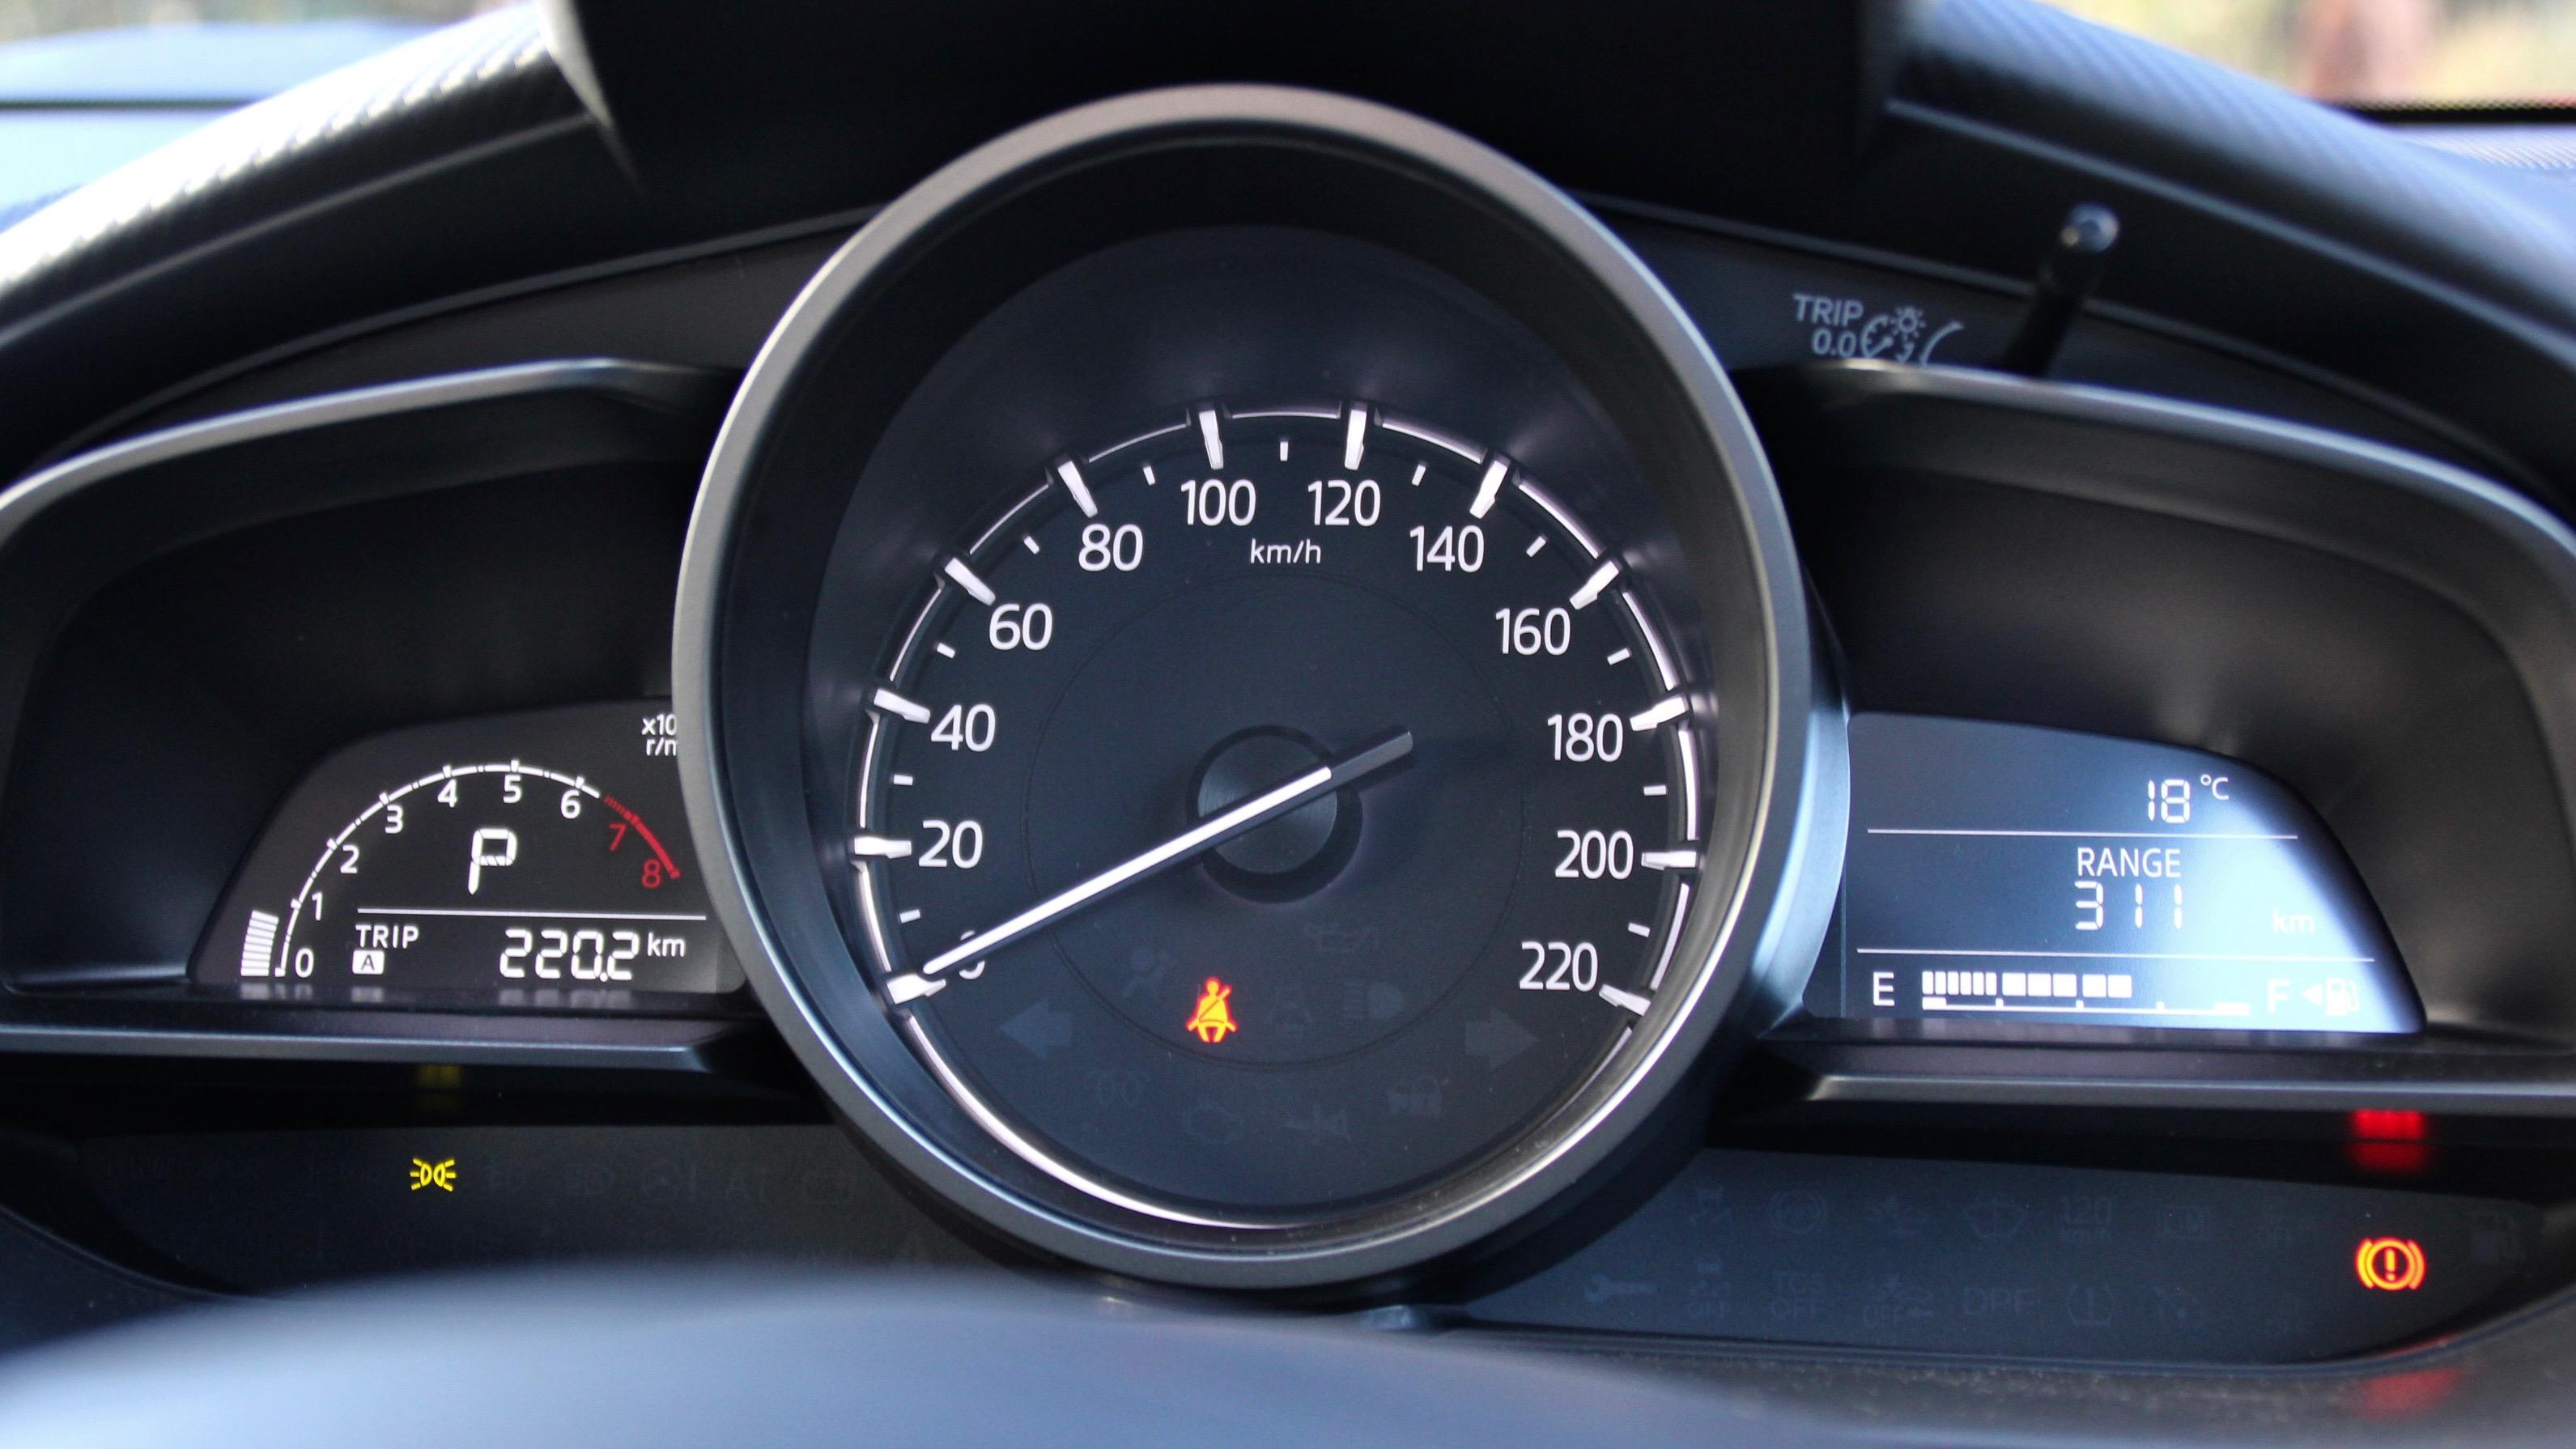 2018 Mazda CX-3 dials